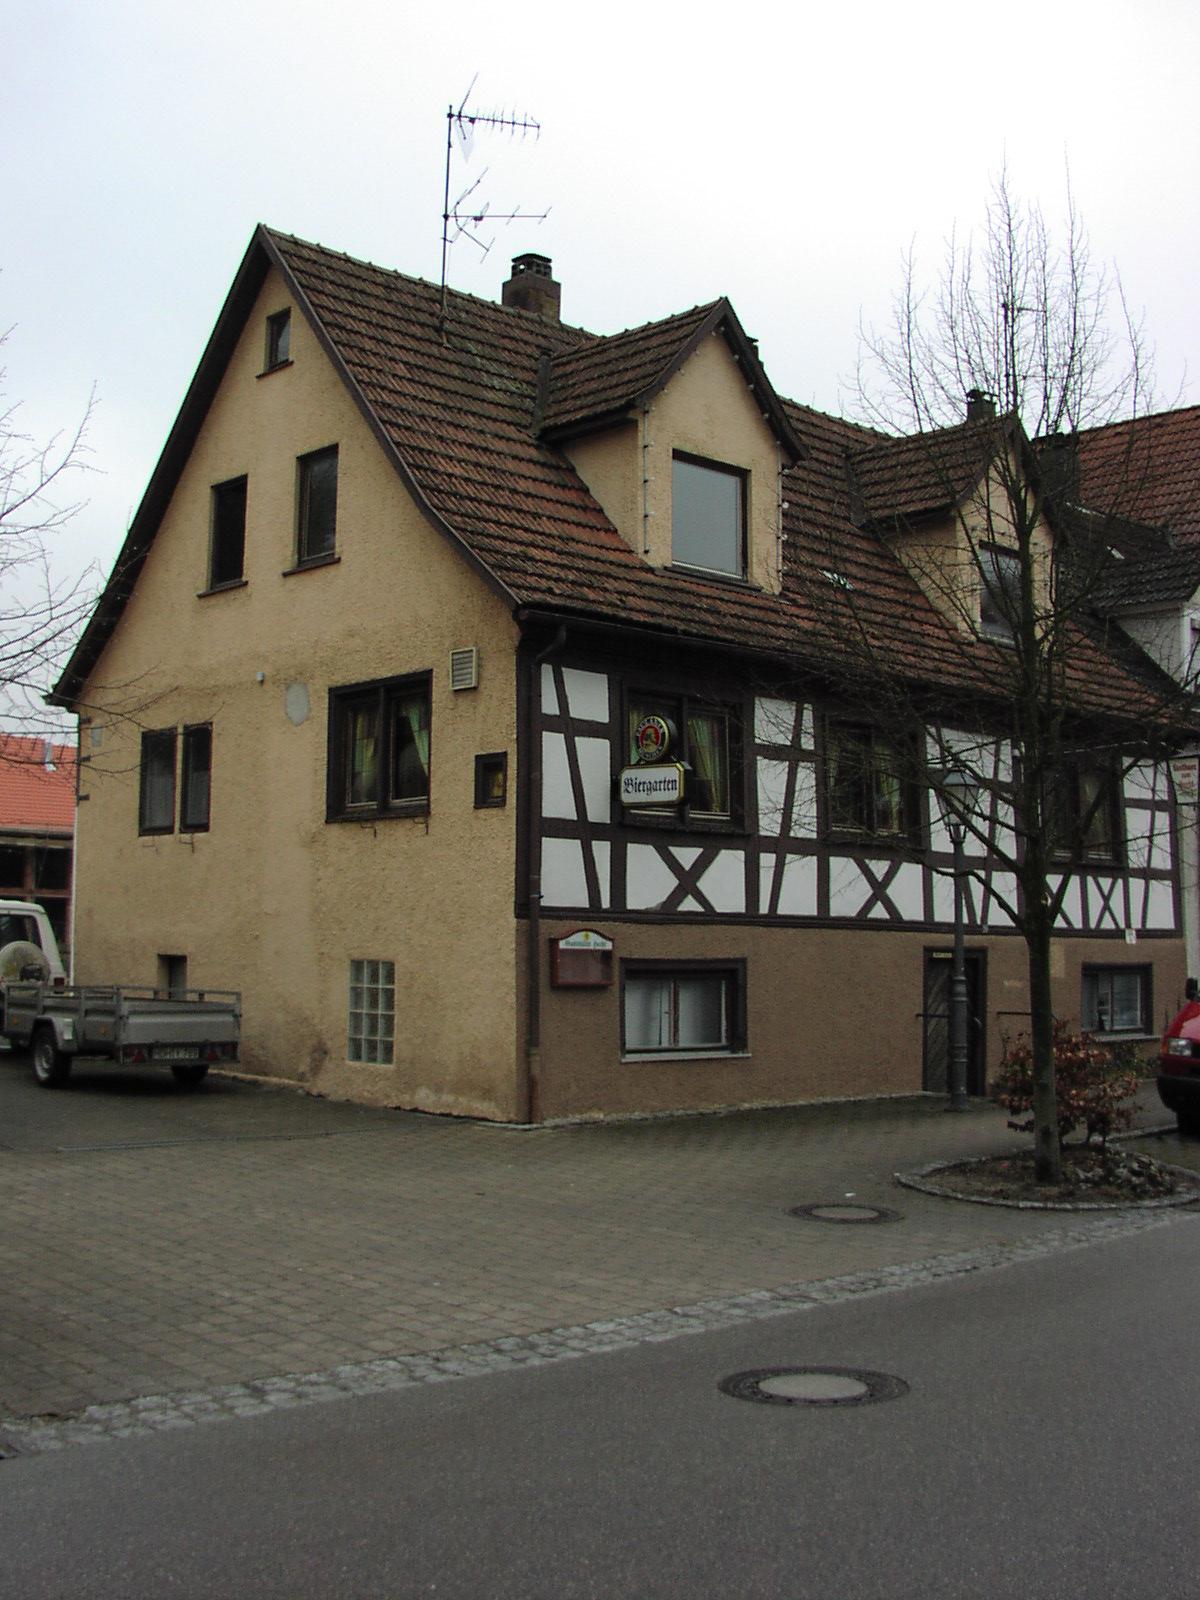 Konigsbronn Klosterbrauerei Konigsbronn Ag